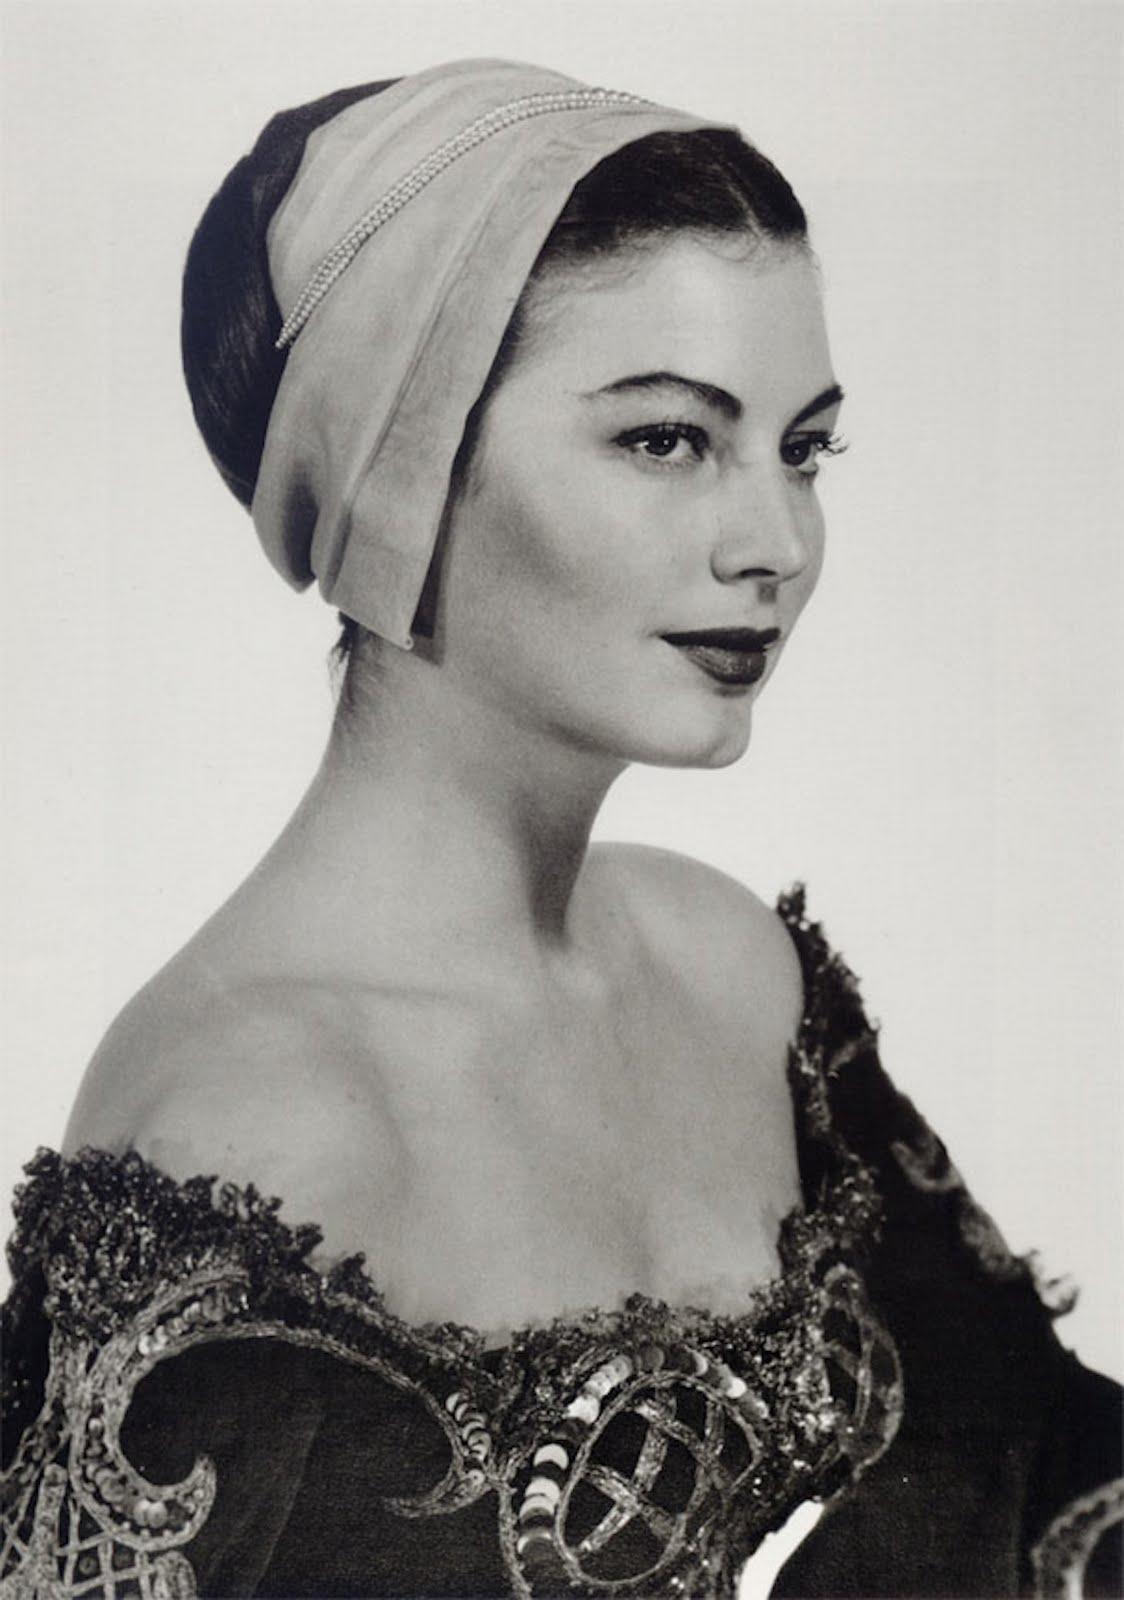 Man Ray ~ Ava Gardner 'Pandora', 1950 [1]